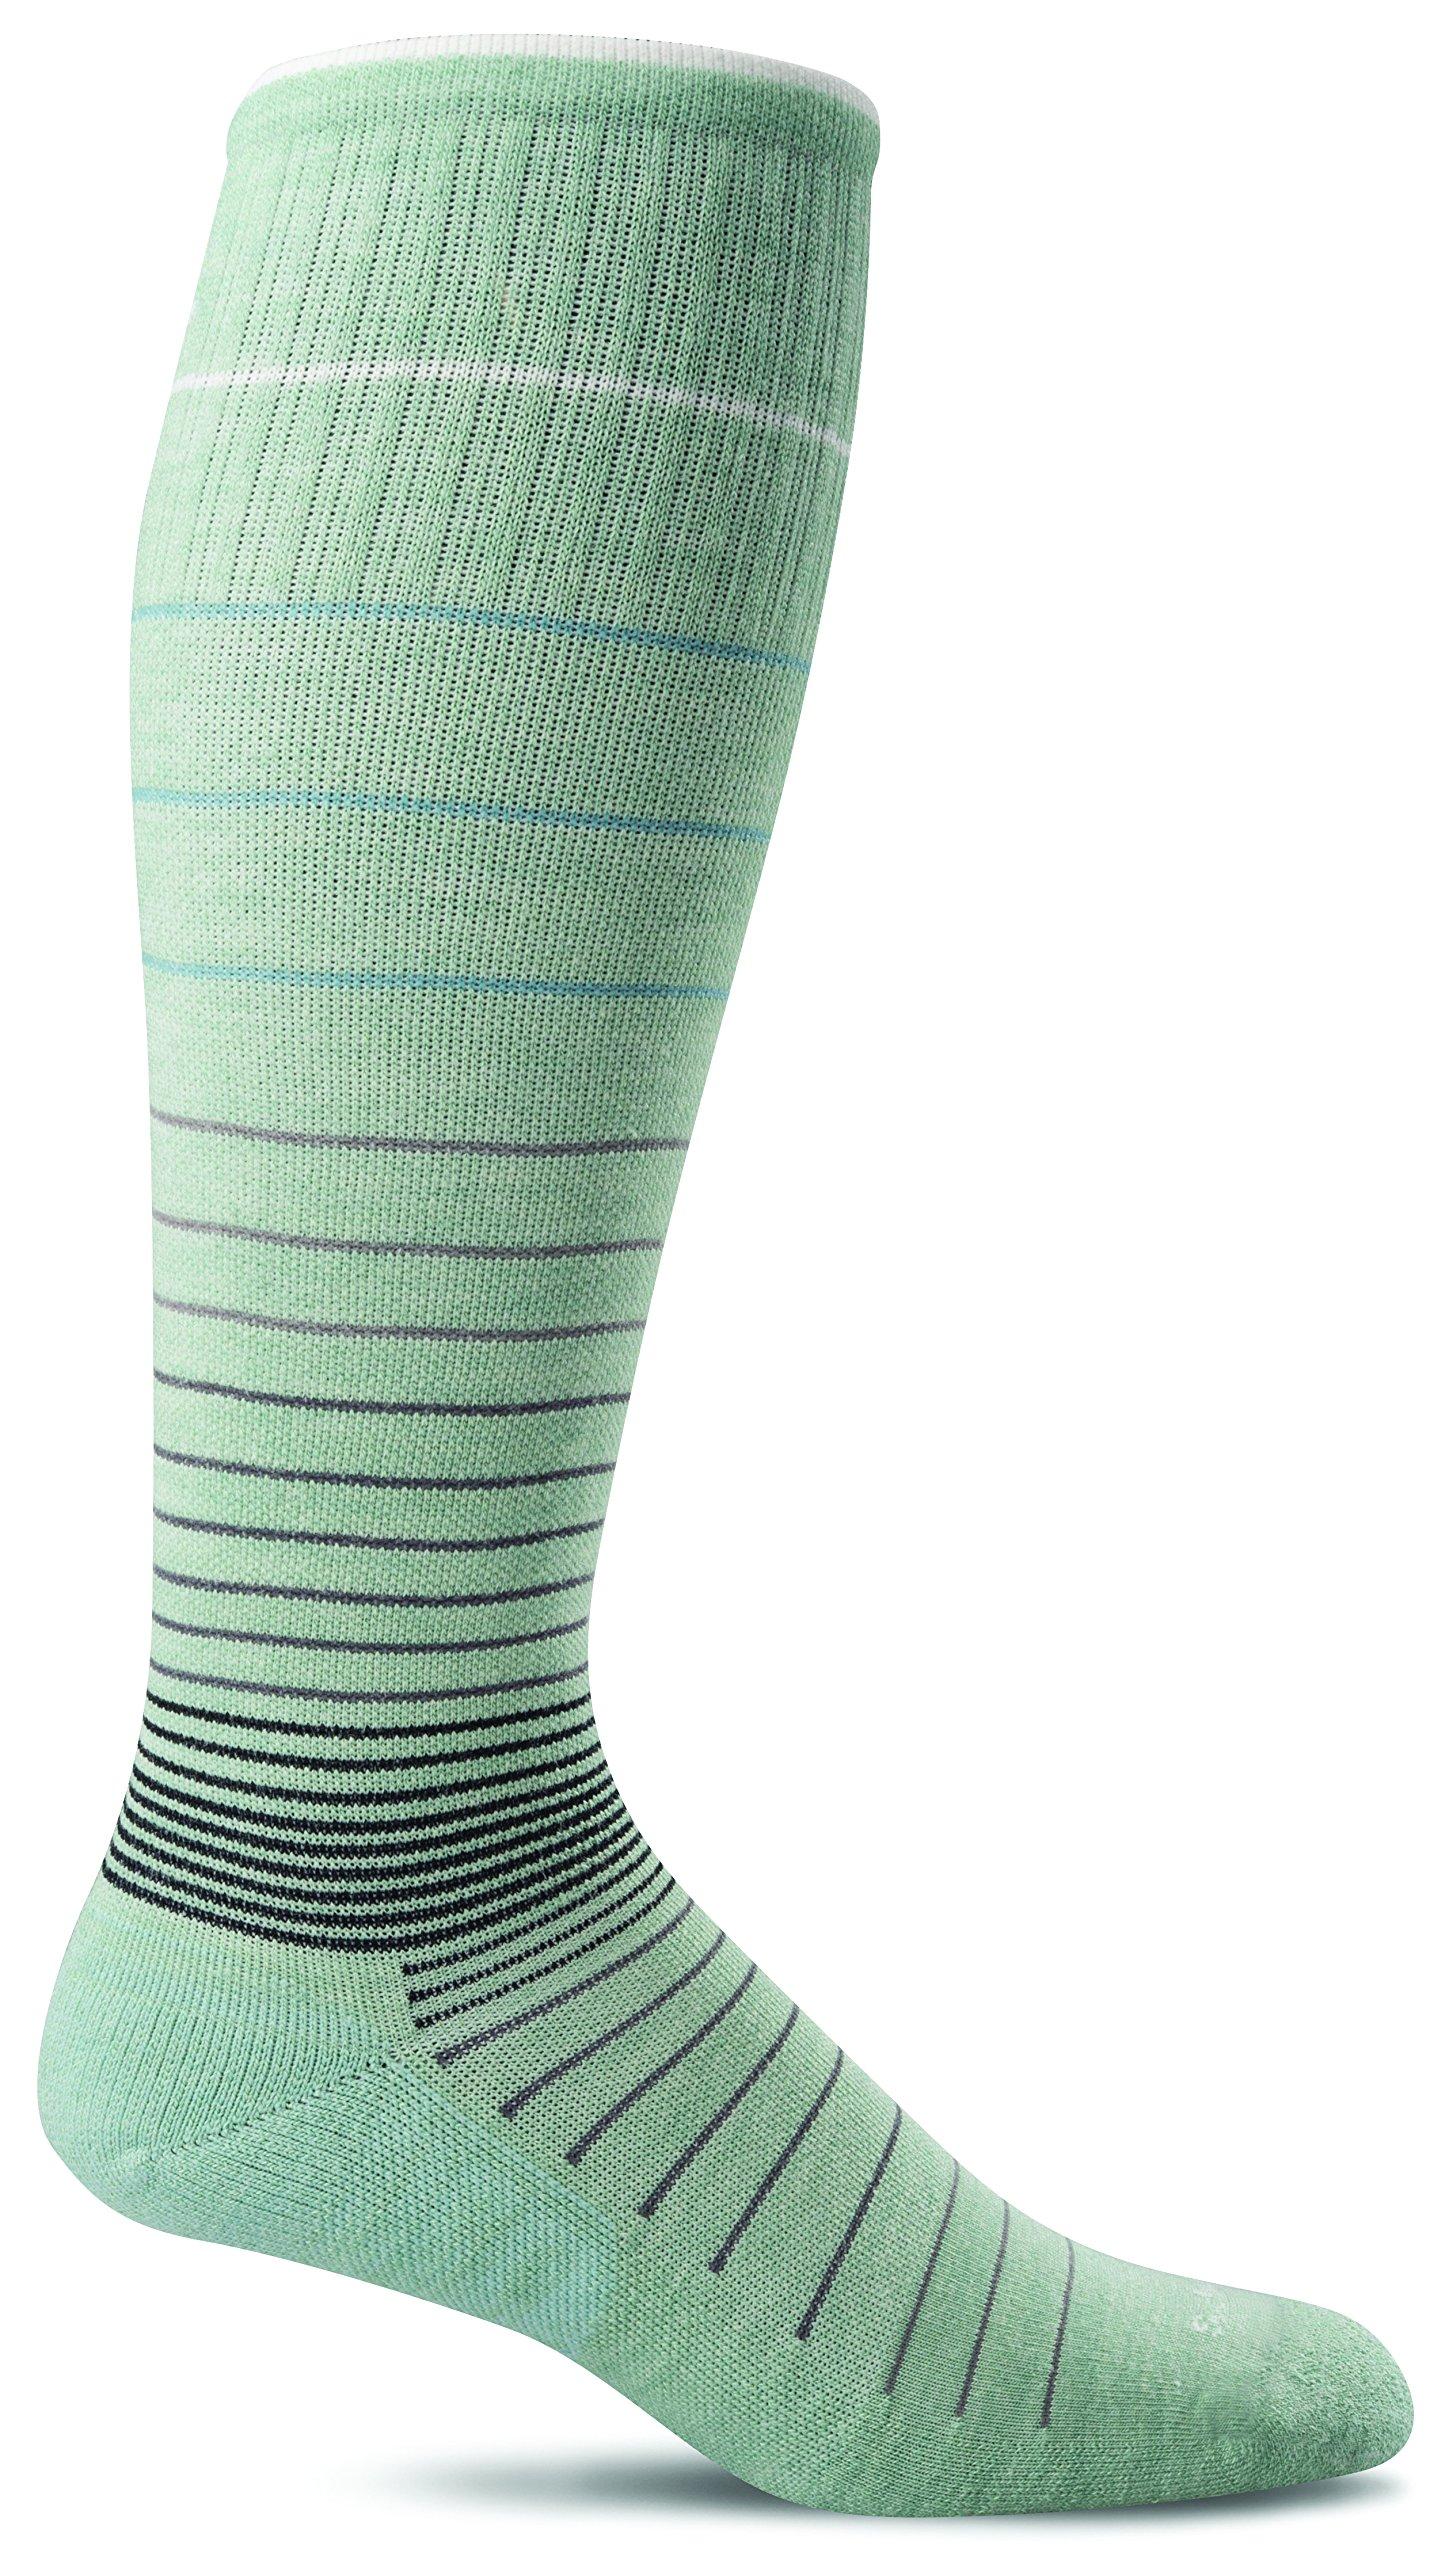 Sockwell Women's Circulator Graduated Compression Socks, Small/Medium (4-7.5), Celadon